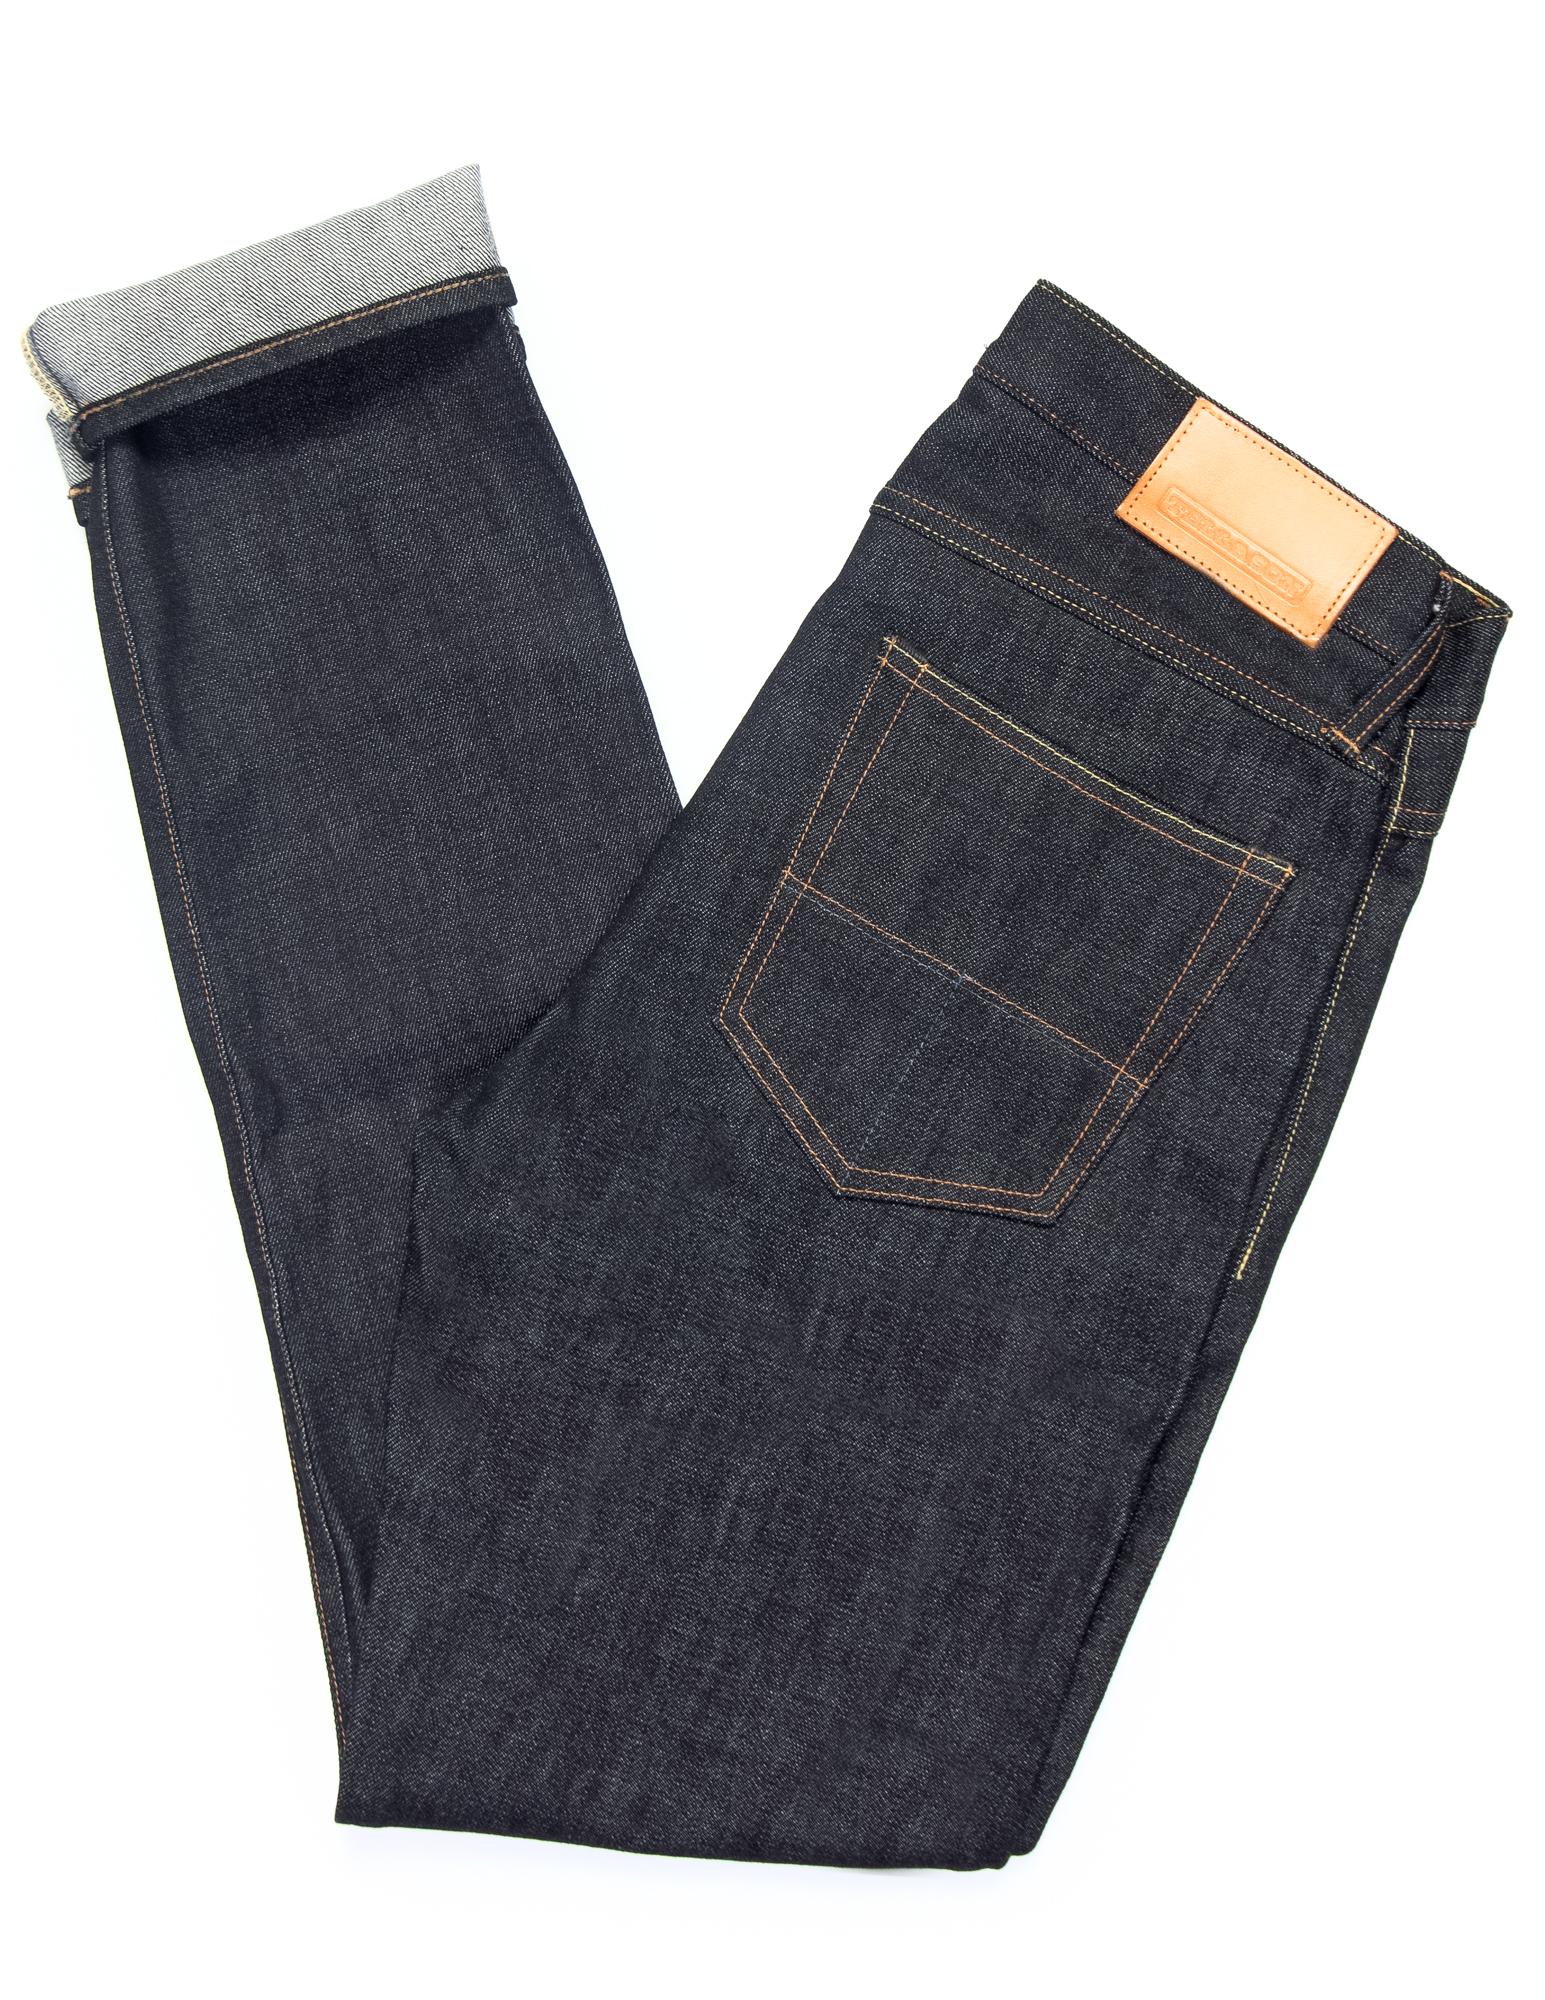 Tellason TE2255 Midrise Slim Tapered Jeans